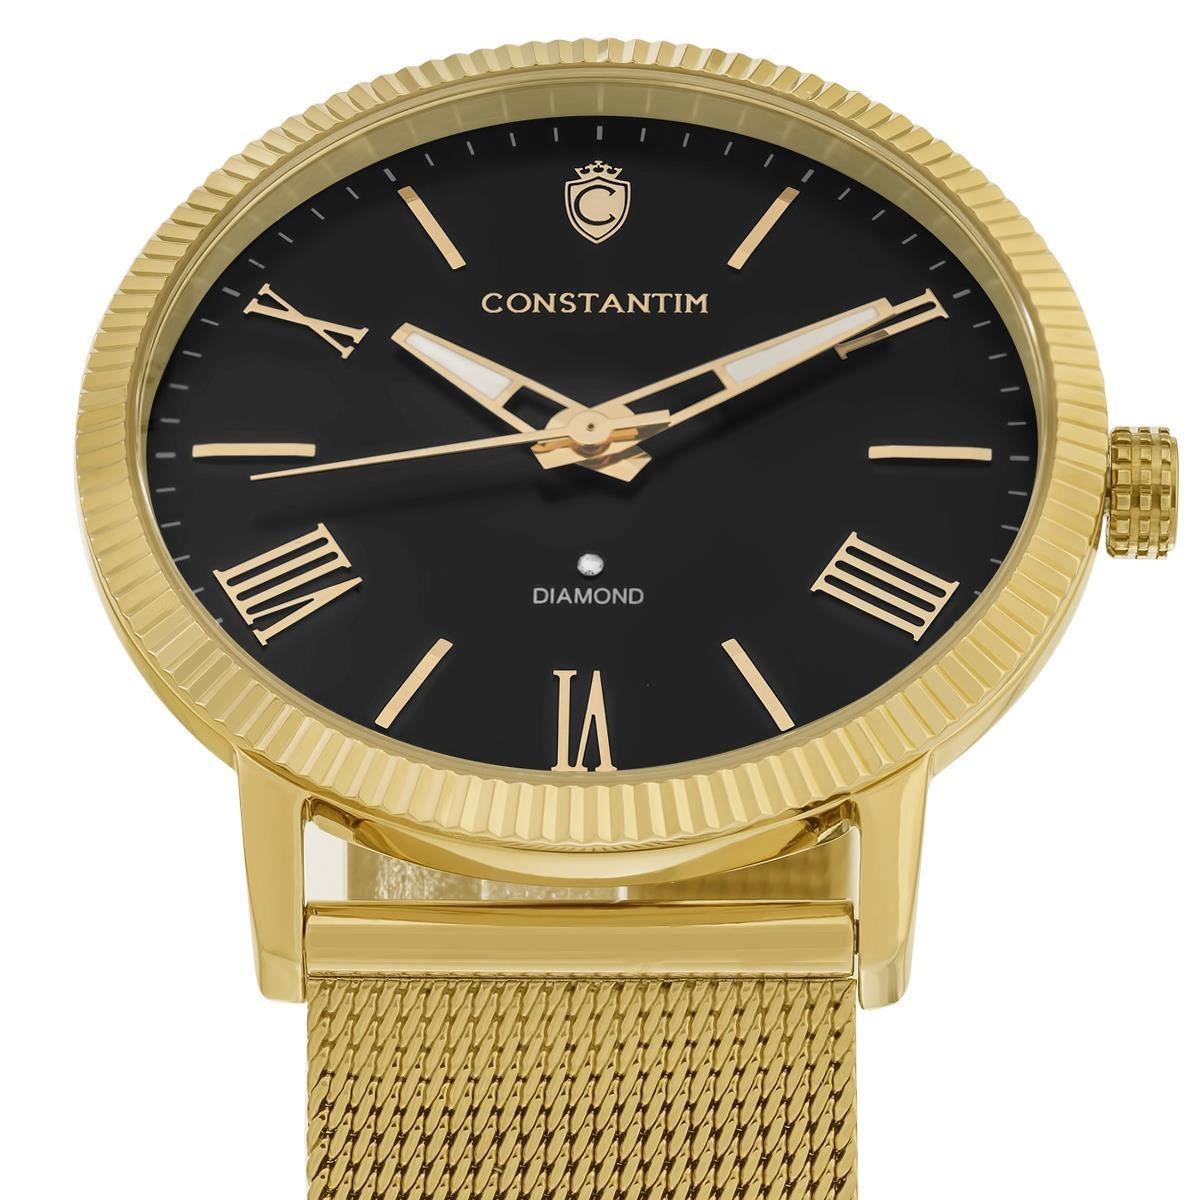 3170c88b598 Relógio Constantim Diamond Gold Black Fundo Preto - R  849